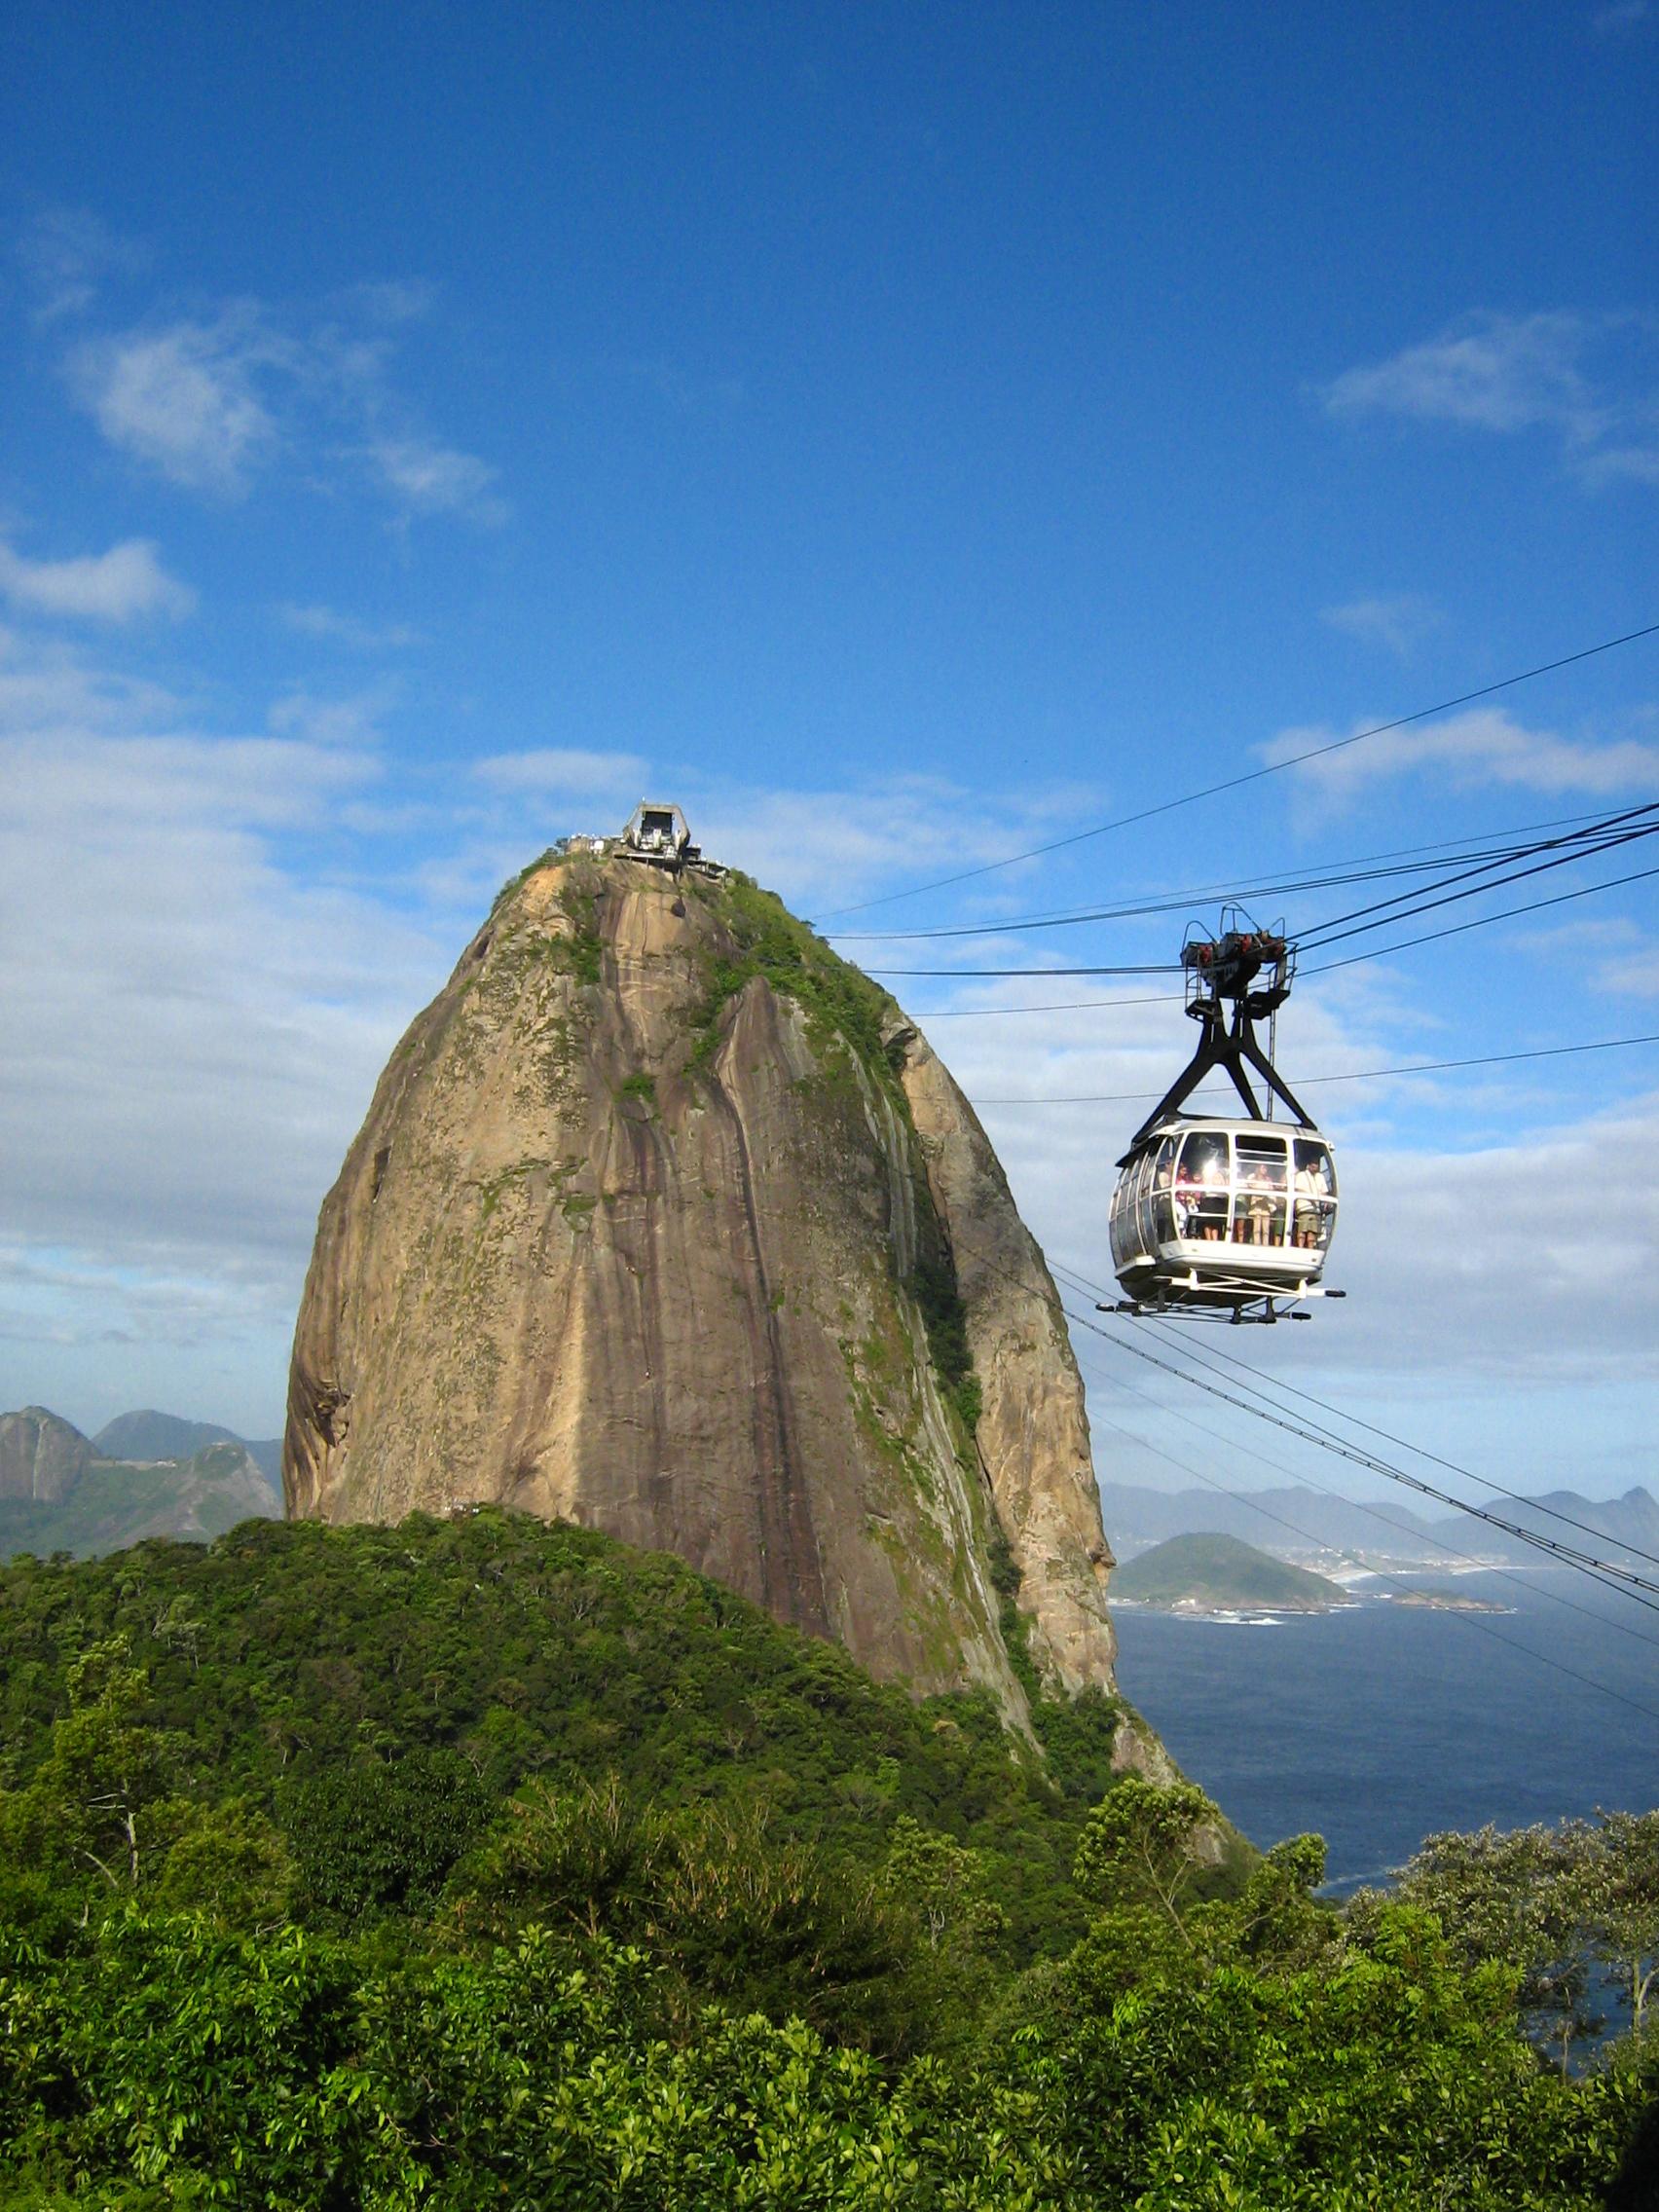 Brazil - Page 12 Rio_de_Janeiro_-_P%C3%A3o_de_A%C3%A7ucar_-_Cablecar